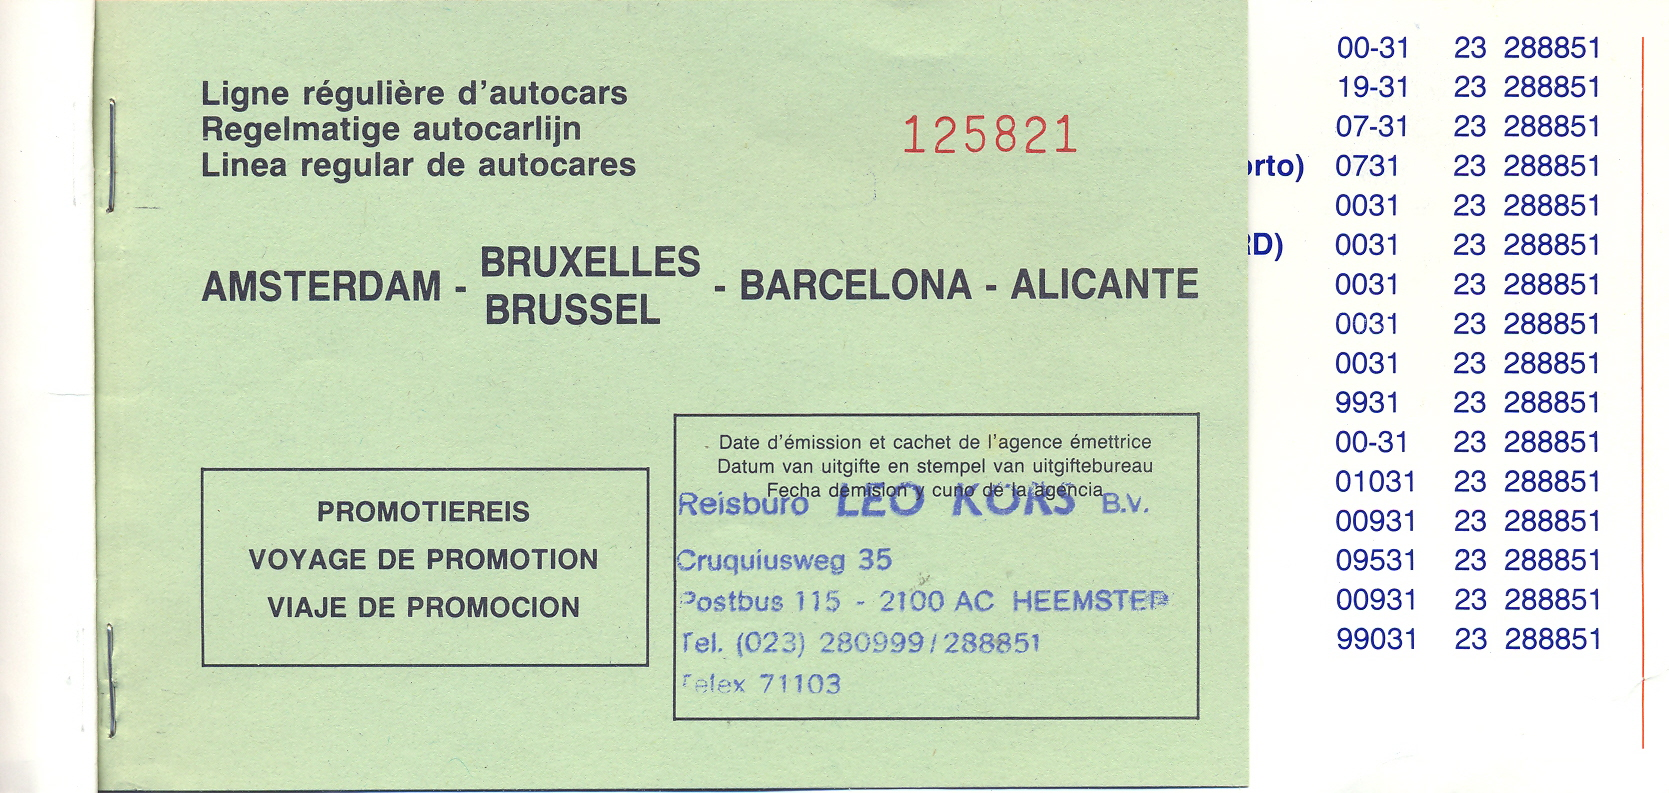 ticket-spanje-jaren-80